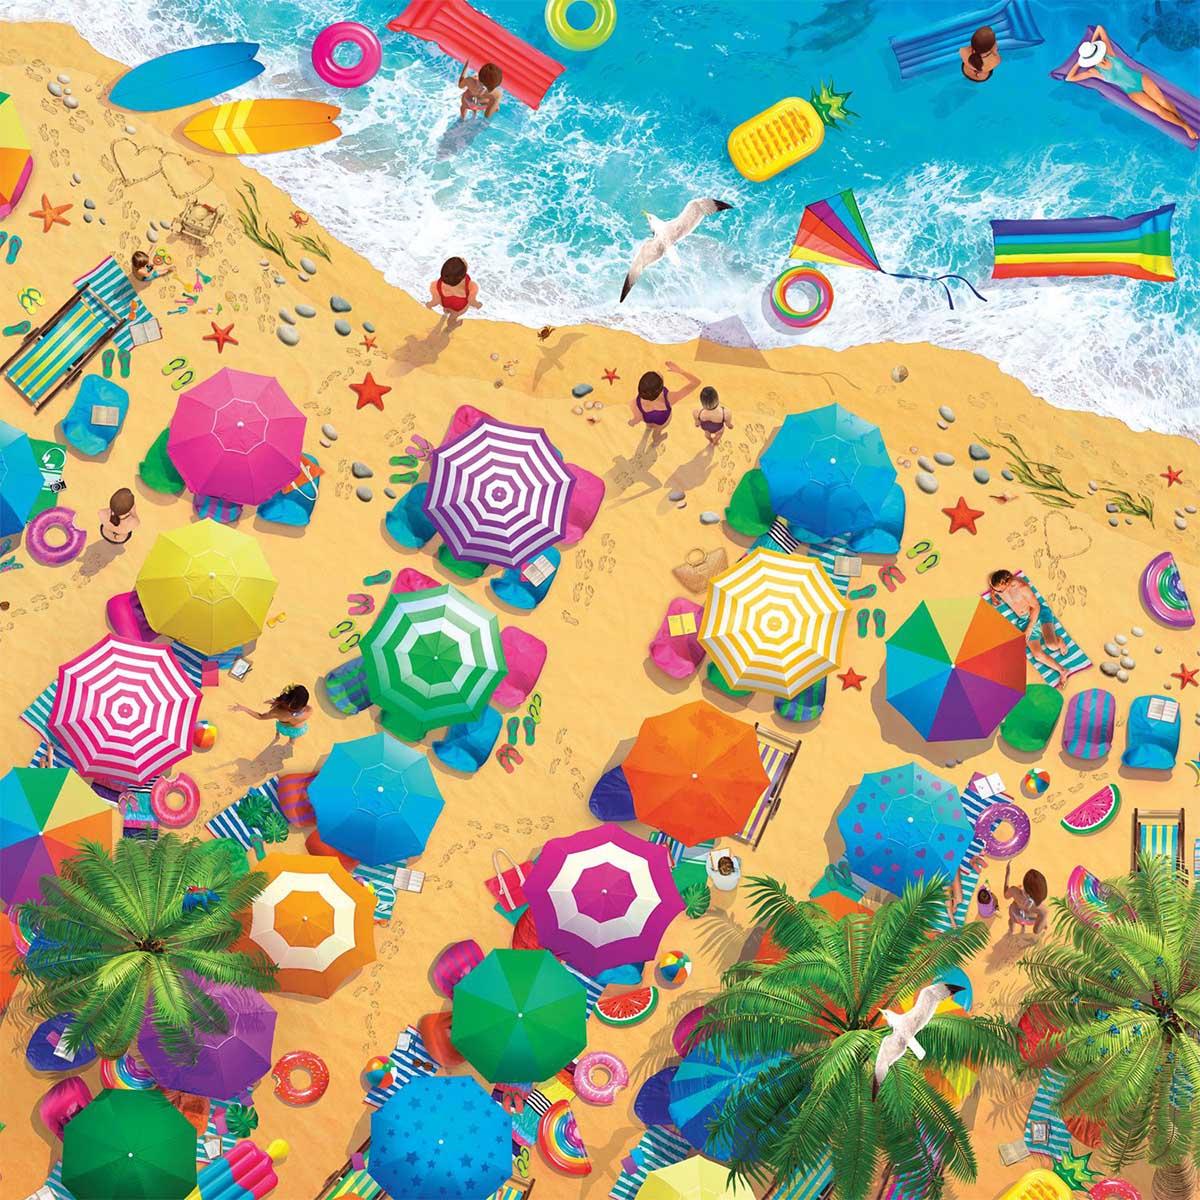 Fun in the Sun Beach Jigsaw Puzzle